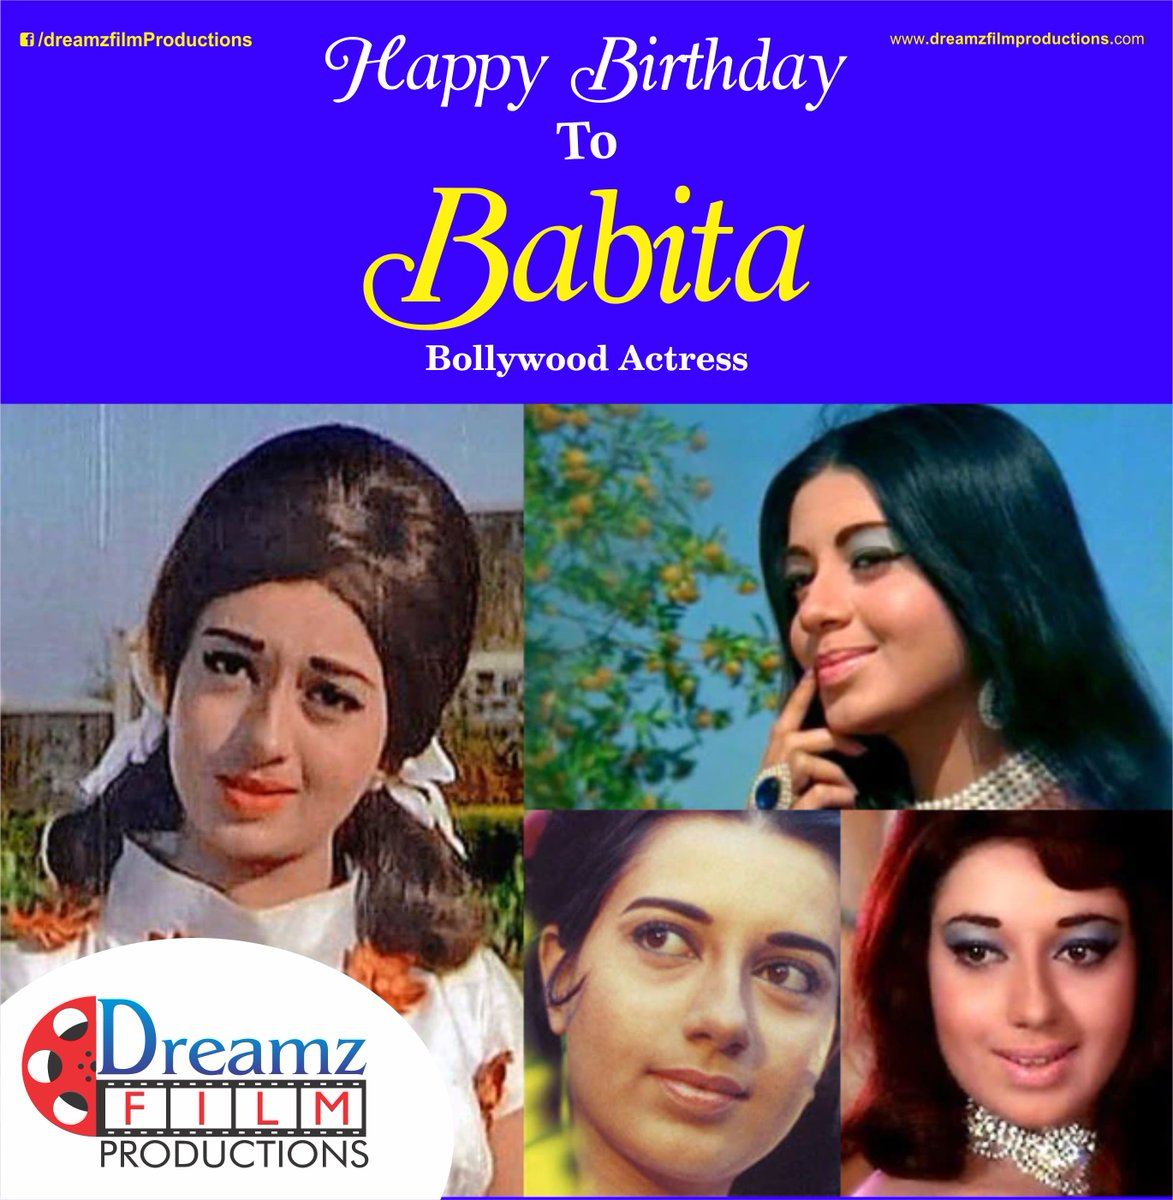 @DreamzFilm wishes you a very Happy Birthday to #BabitaKapoor (Indian #Actress) #DreamzFilm #HappyBirthdayBabitaKapoor  #BollywoodFilms